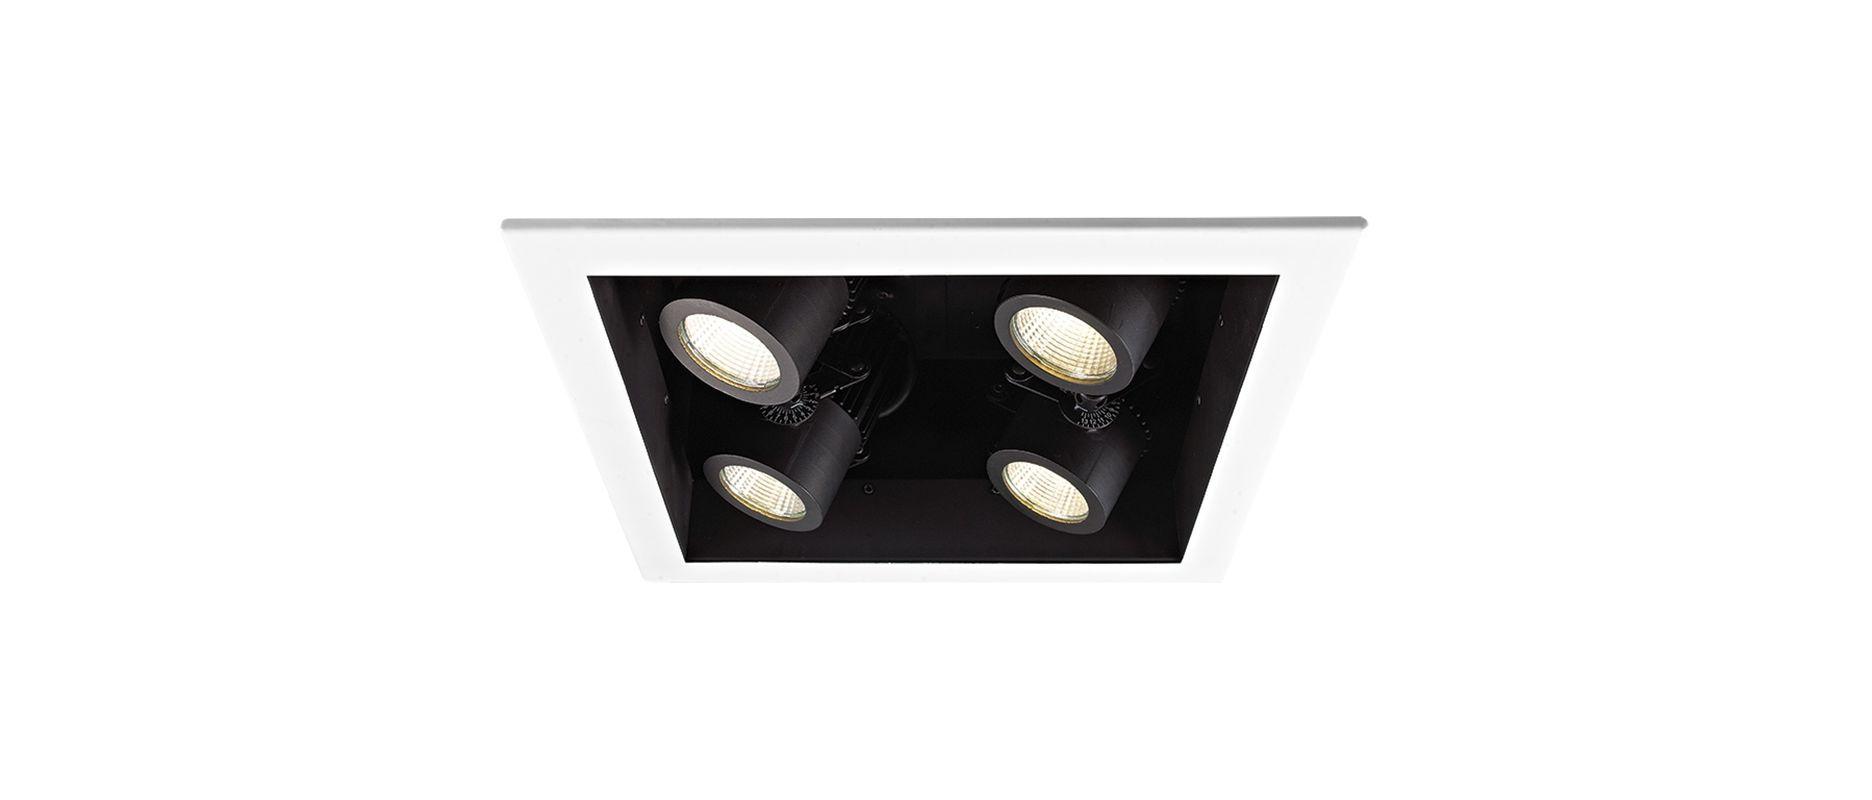 WAC Lighting MT-4LD226N-F30 4 Light Energy Star 3000K High Output LED